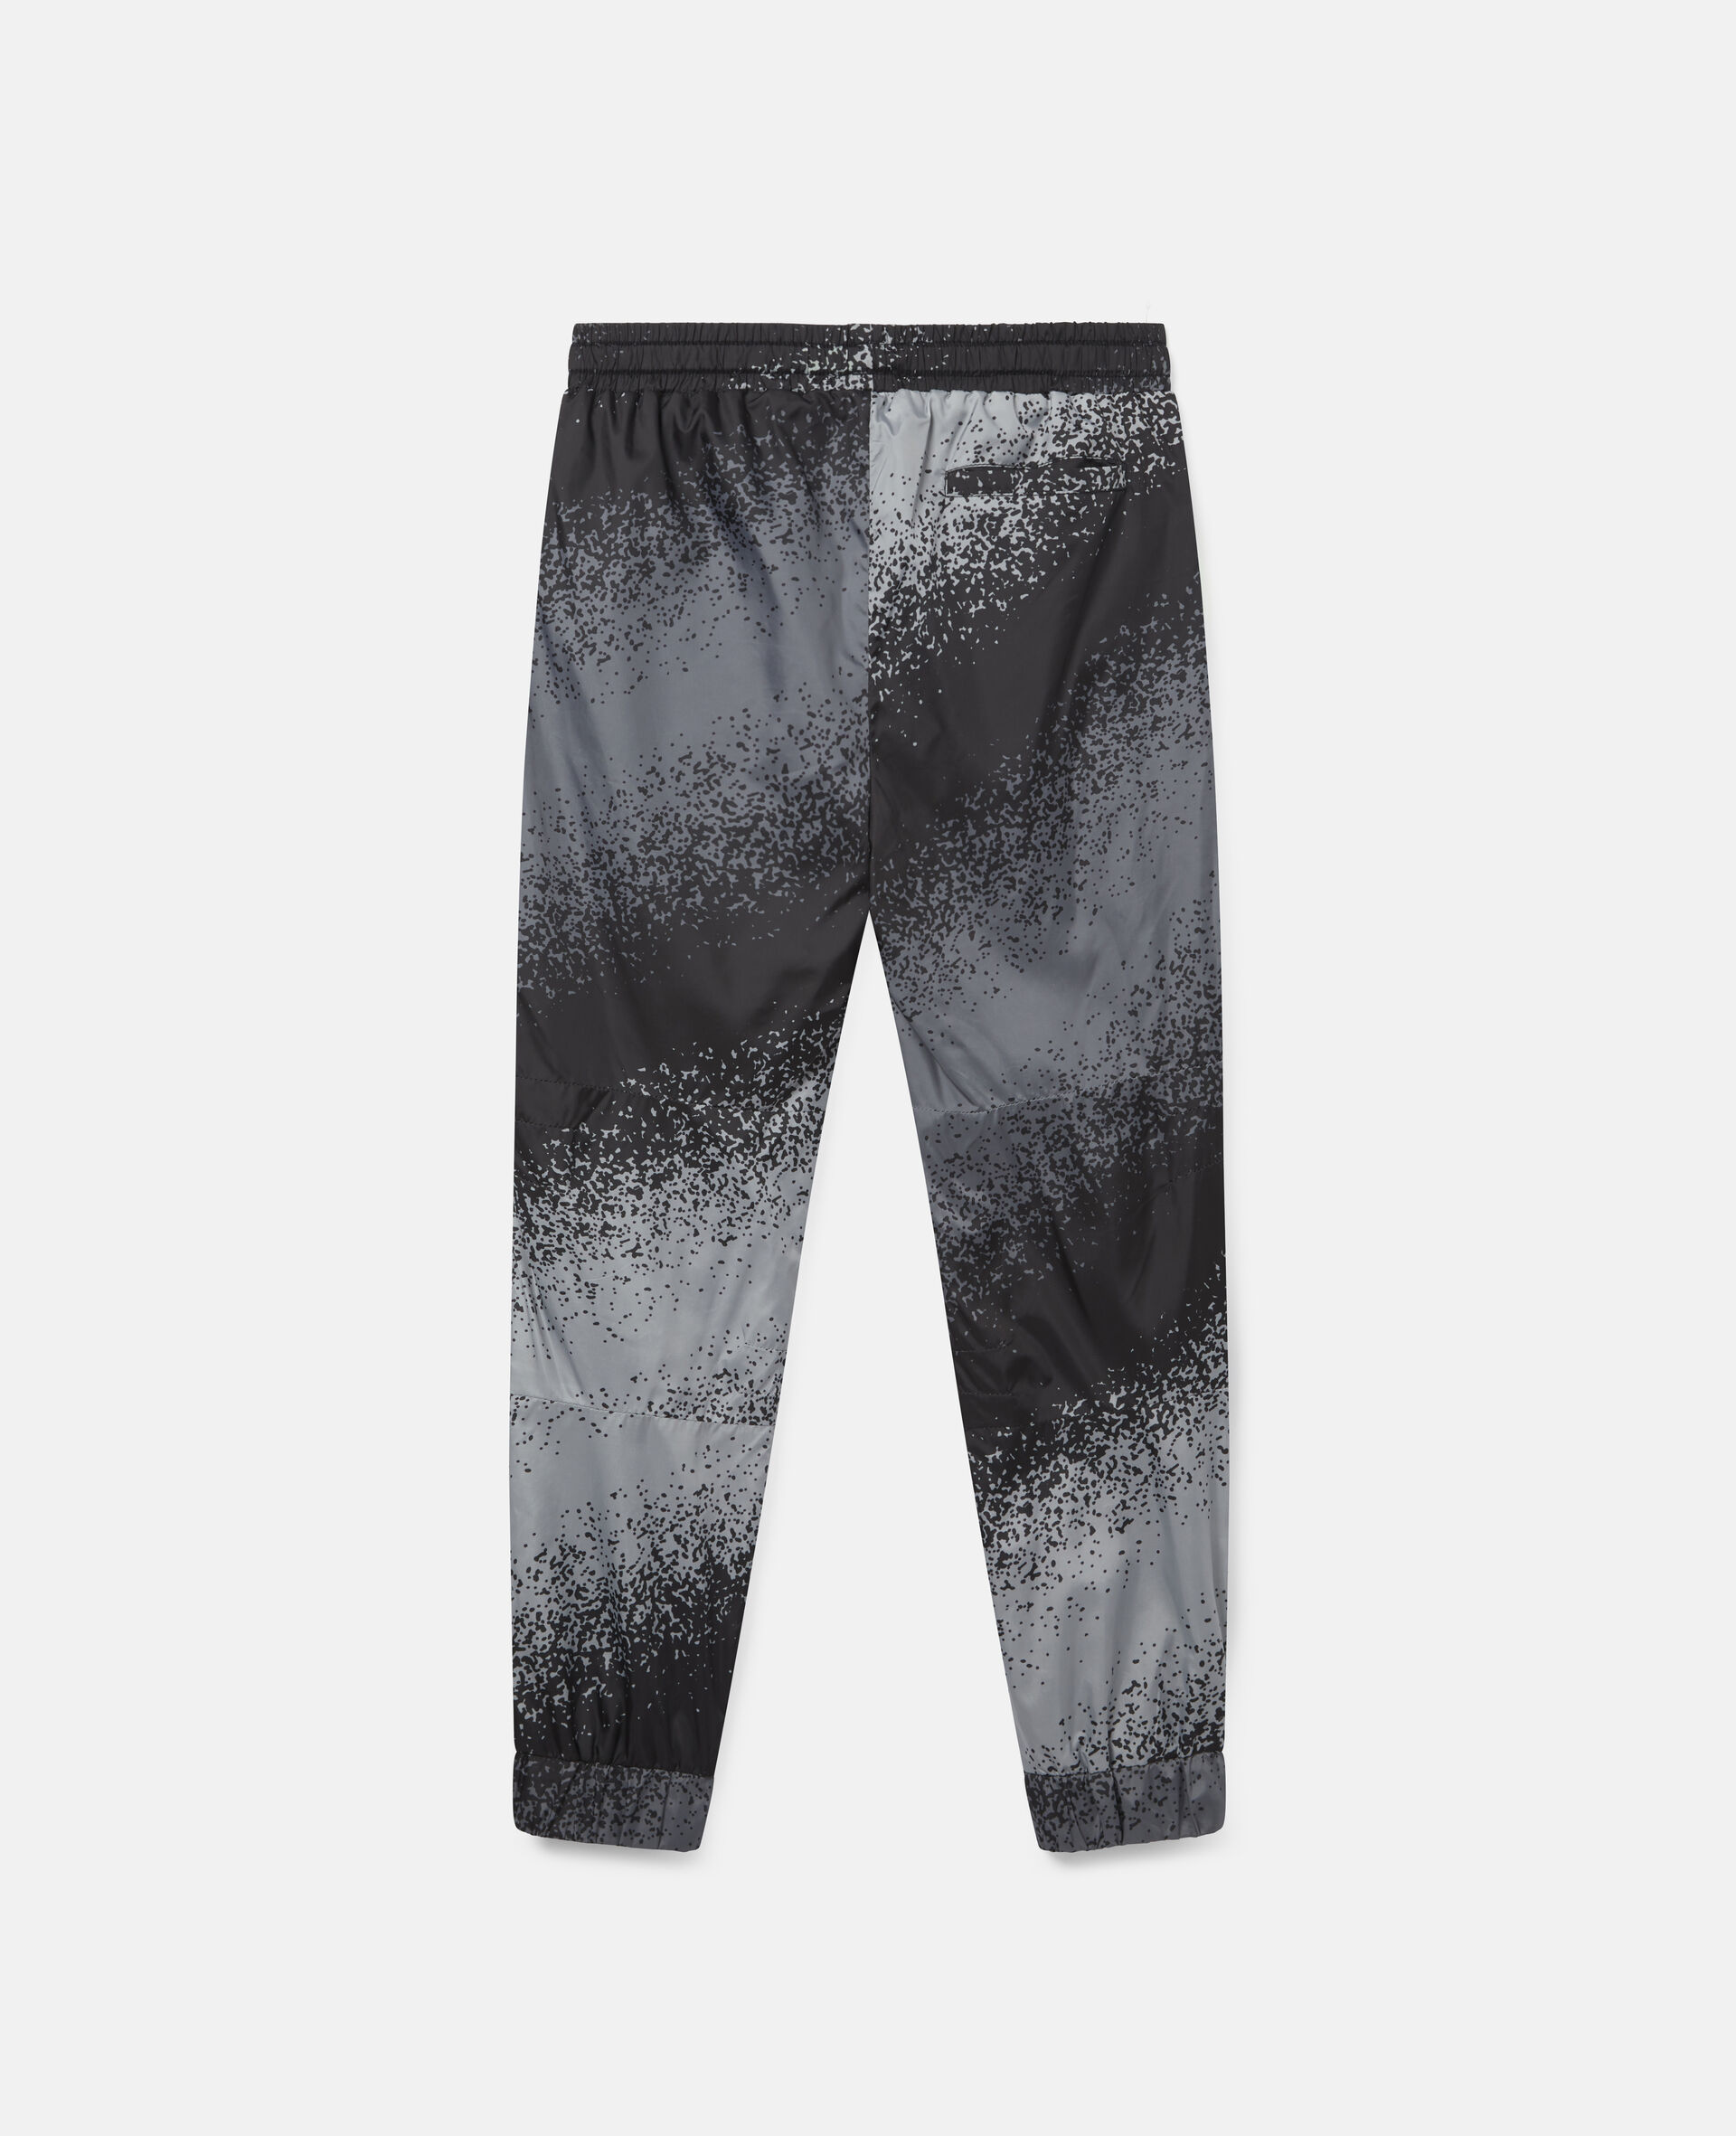 Pantaloni Cargo con Motivo Effetto Spray-Grigio-large image number 3